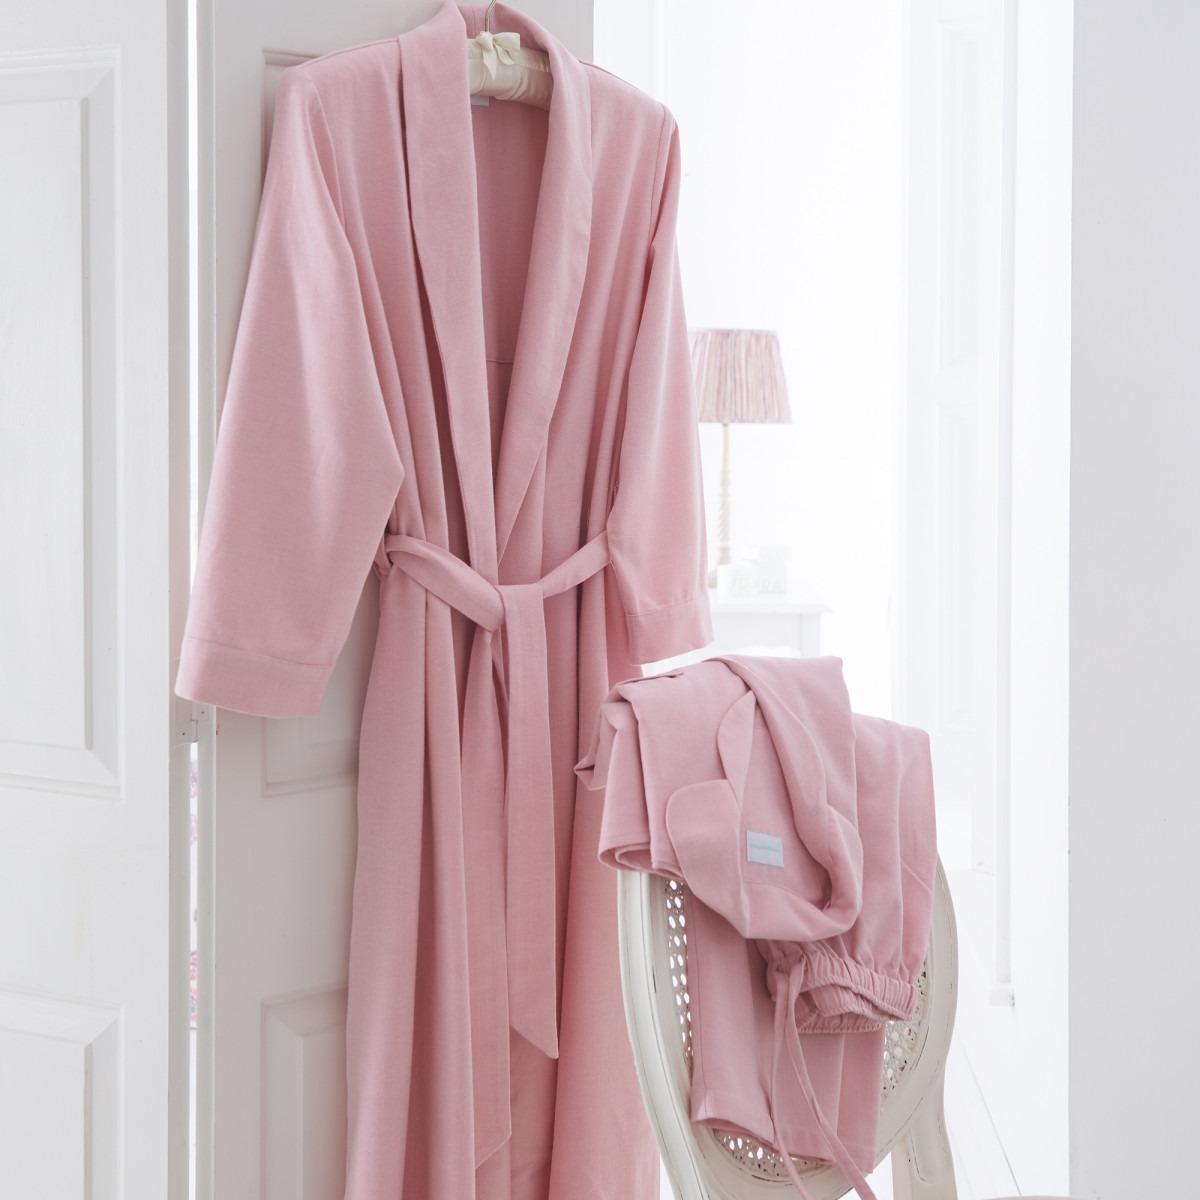 Women's Brushed Cotton Nightwear